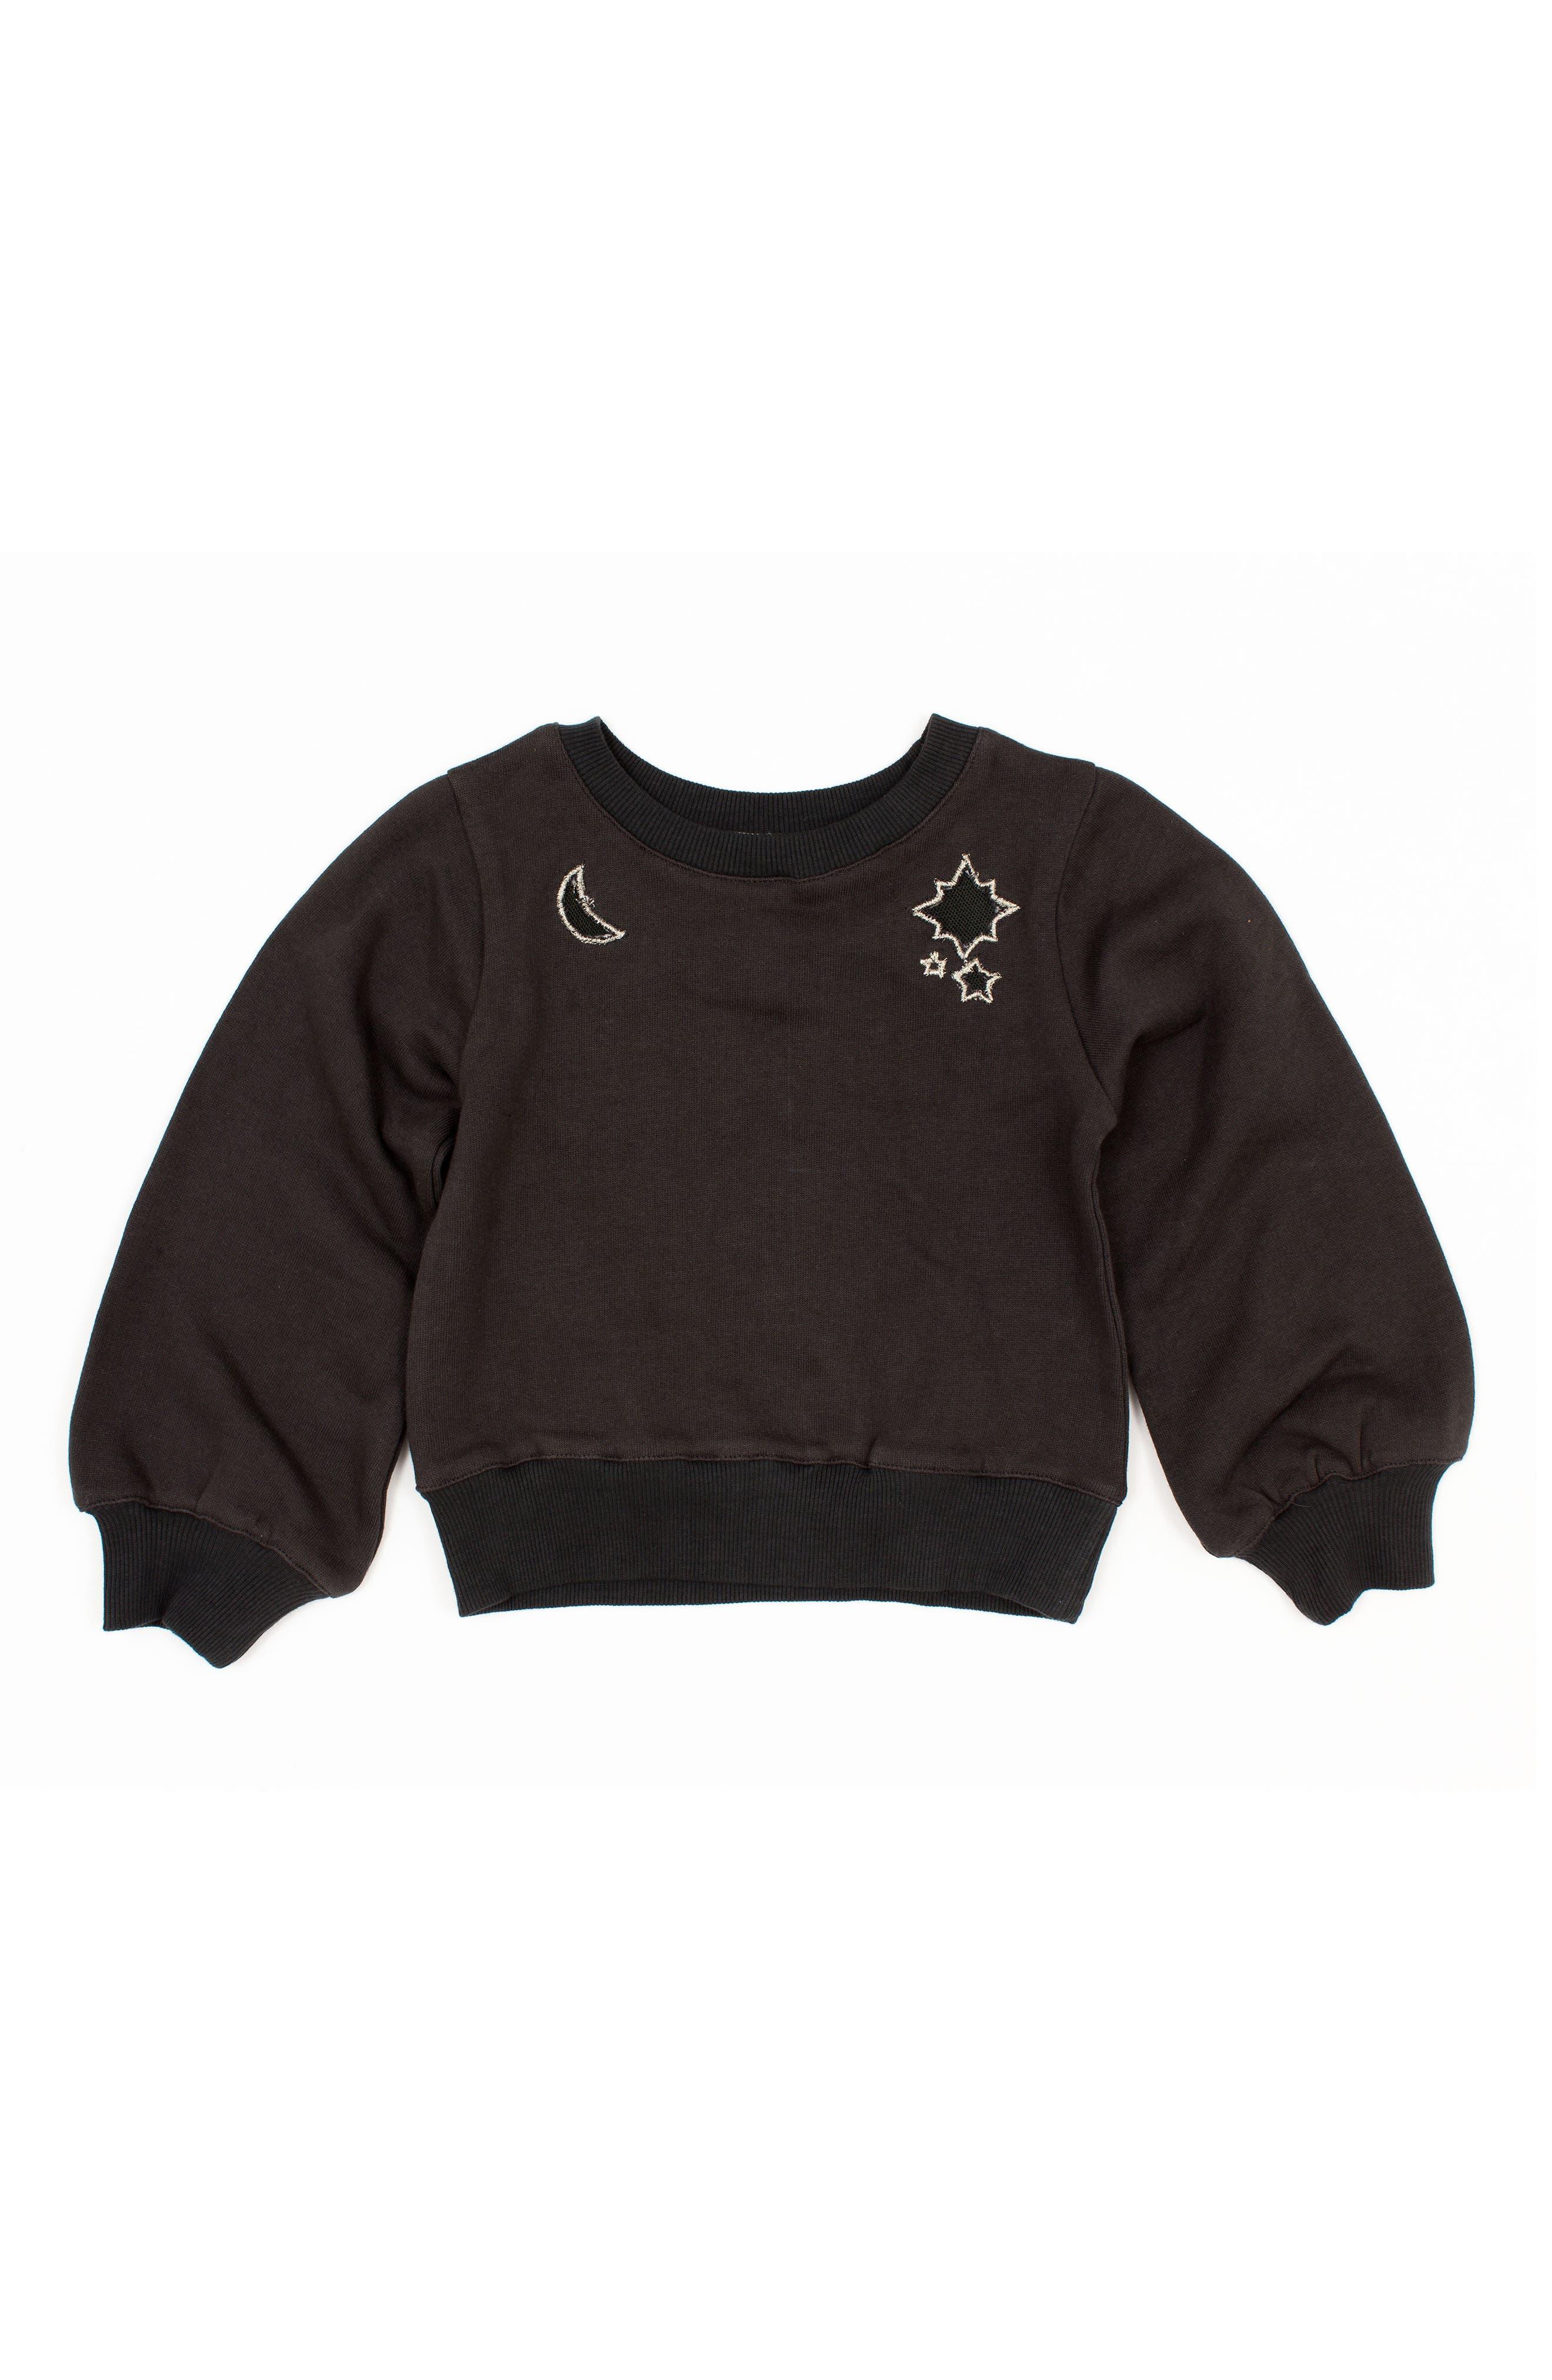 Alternate Image 1 Selected - BOWIE X JAMES Alchemy Sweatshirt (Toddler Girls, Little Girls & Big Girls)